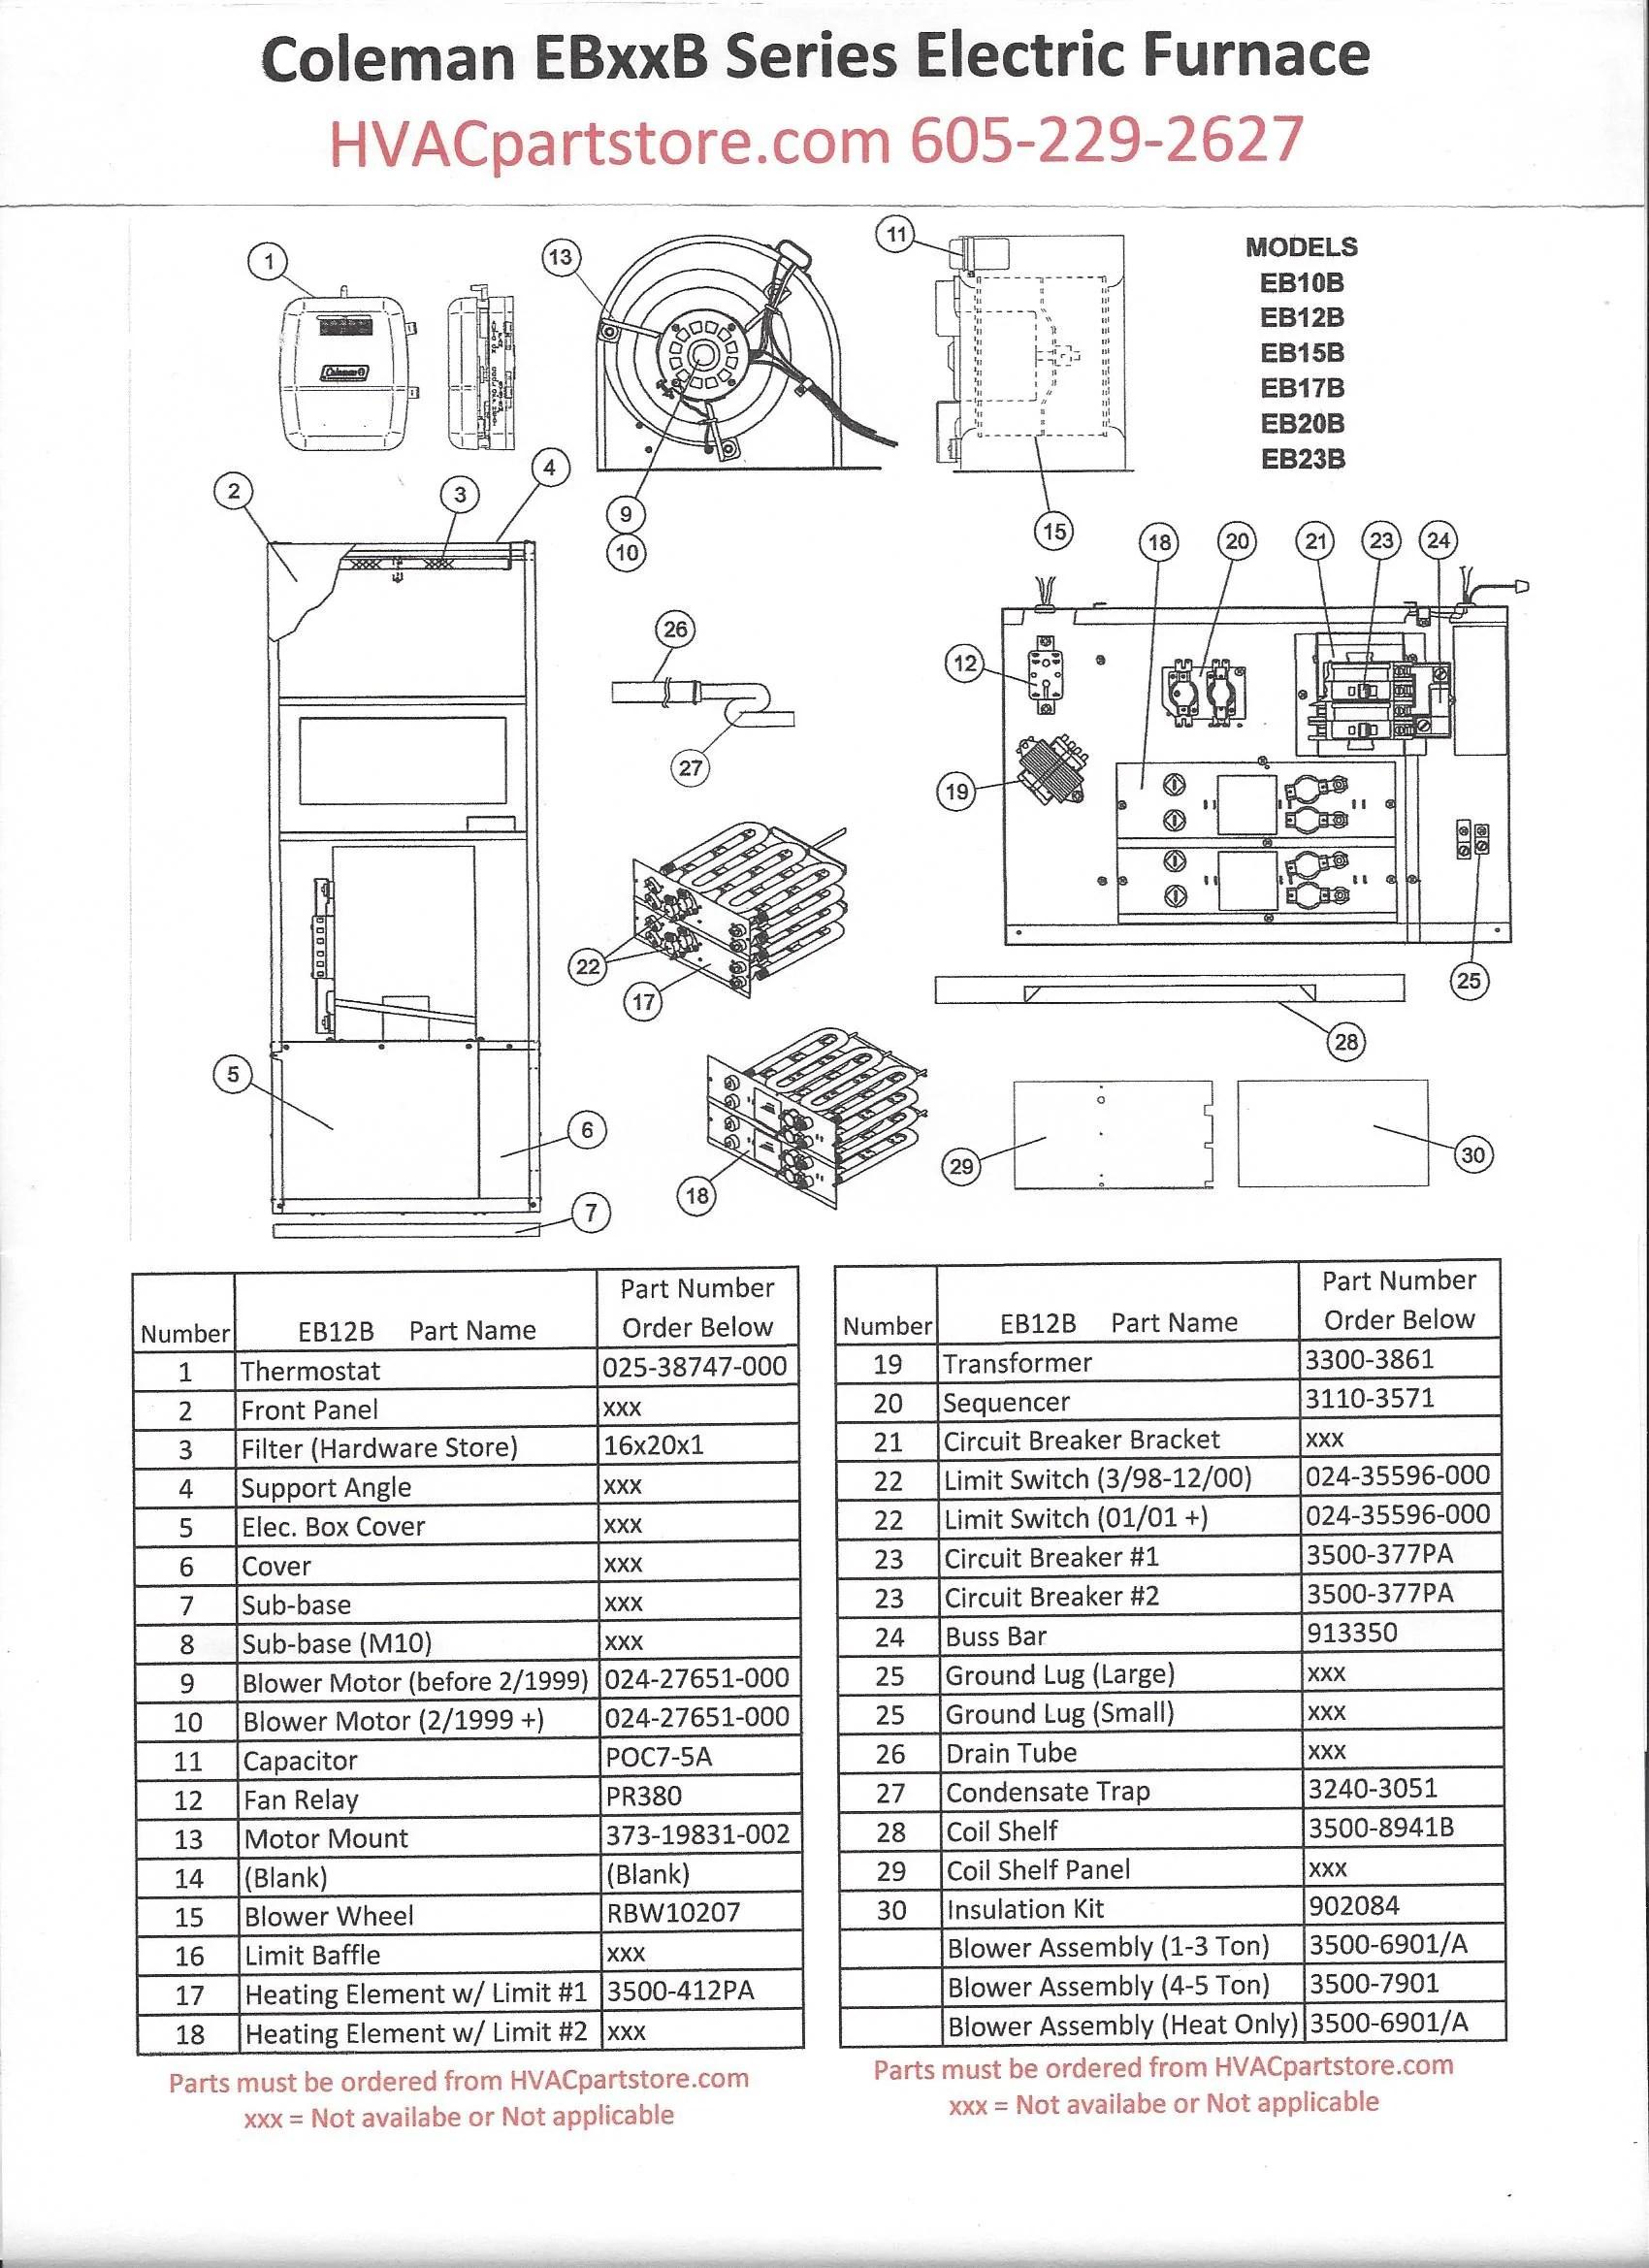 EB12B Coleman Electric Furnace Parts – HVACpartstore